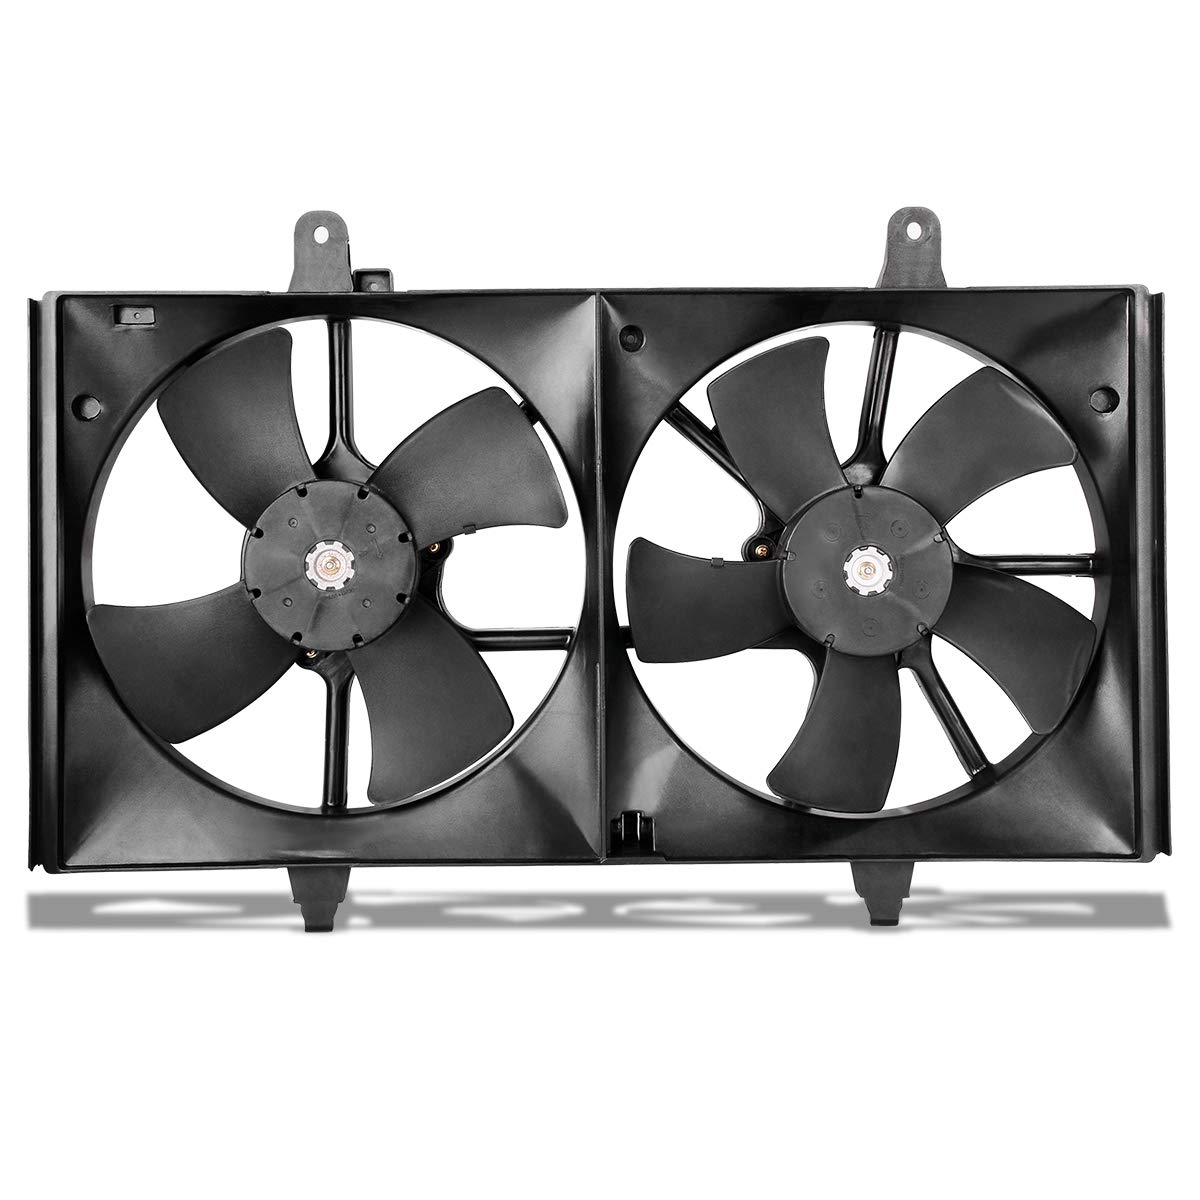 Radiator AC Condenser Cooling Fans For 2002-2006 Nissan Altima 2.5L 3.5L, For 2004-2008 Nissan Maxima 3.5L ATRDF012